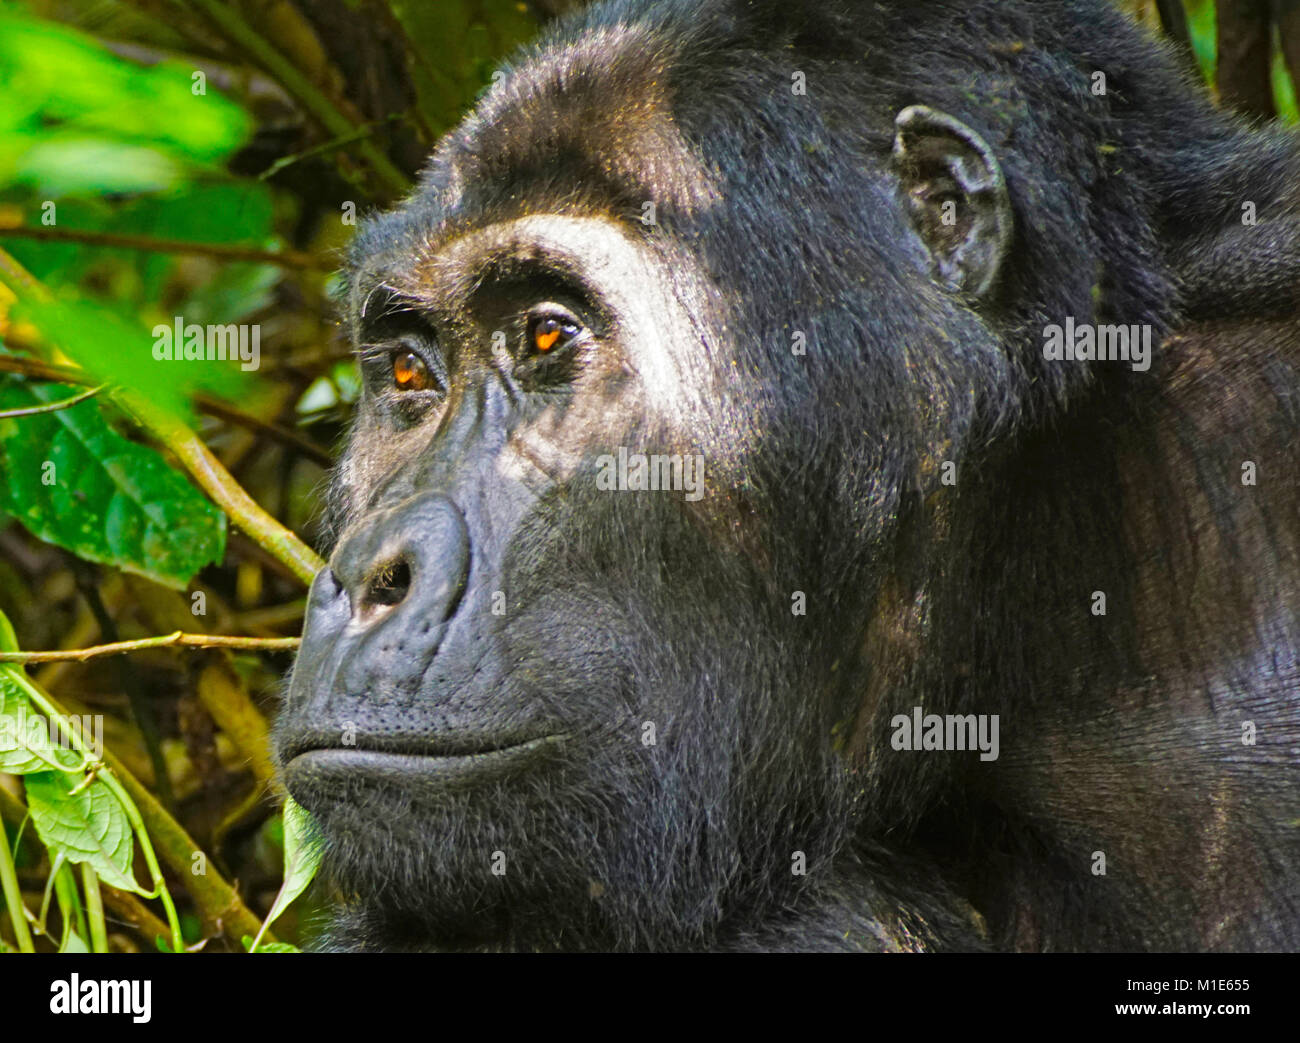 Silverback mountain gorilla in Bwindi Impenerable National Park, Uganda. - Stock Image